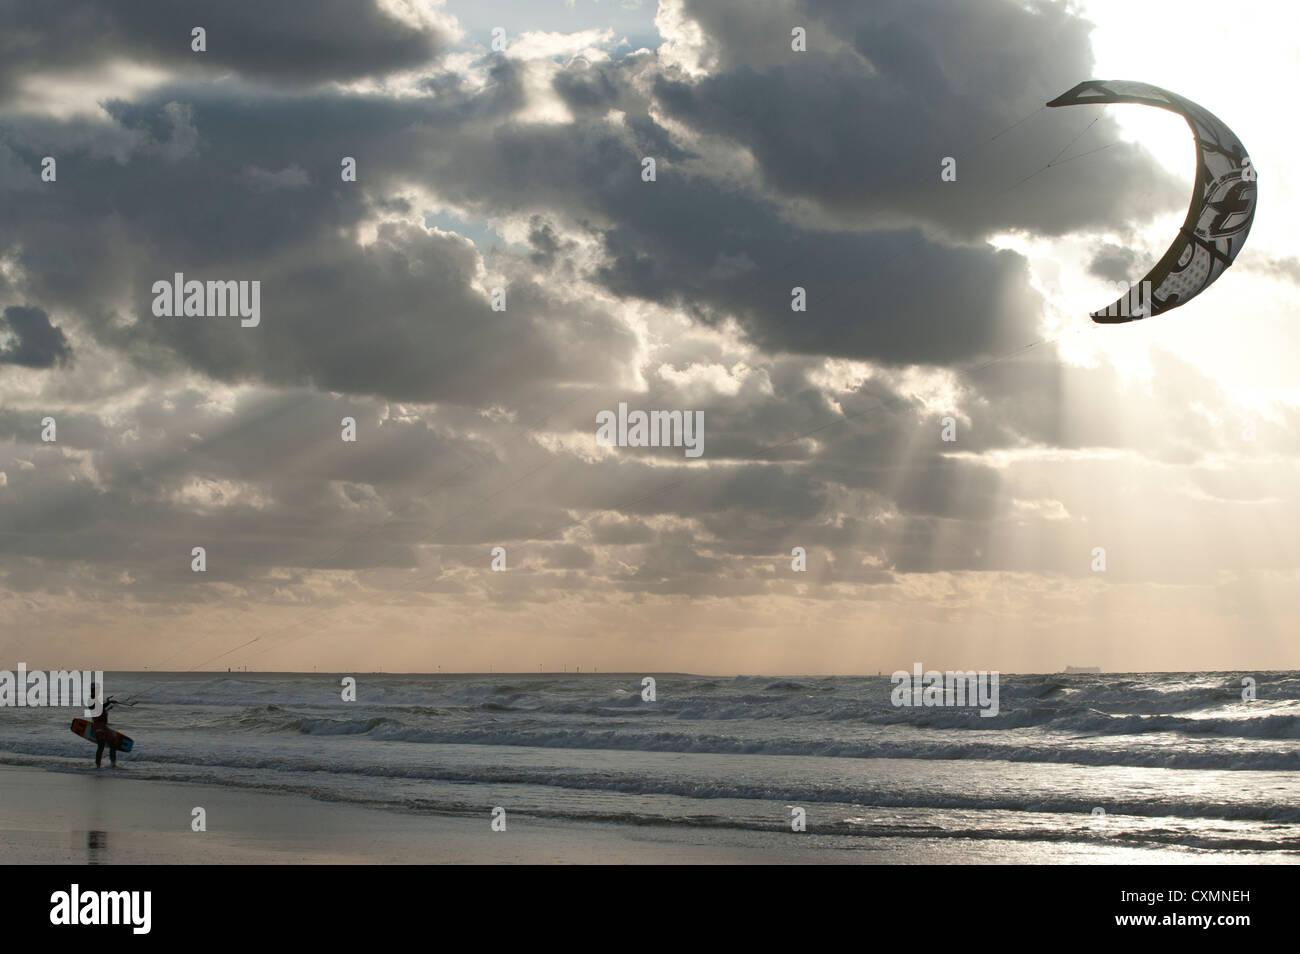 kitesurfer on beach at sunset - Stock Image